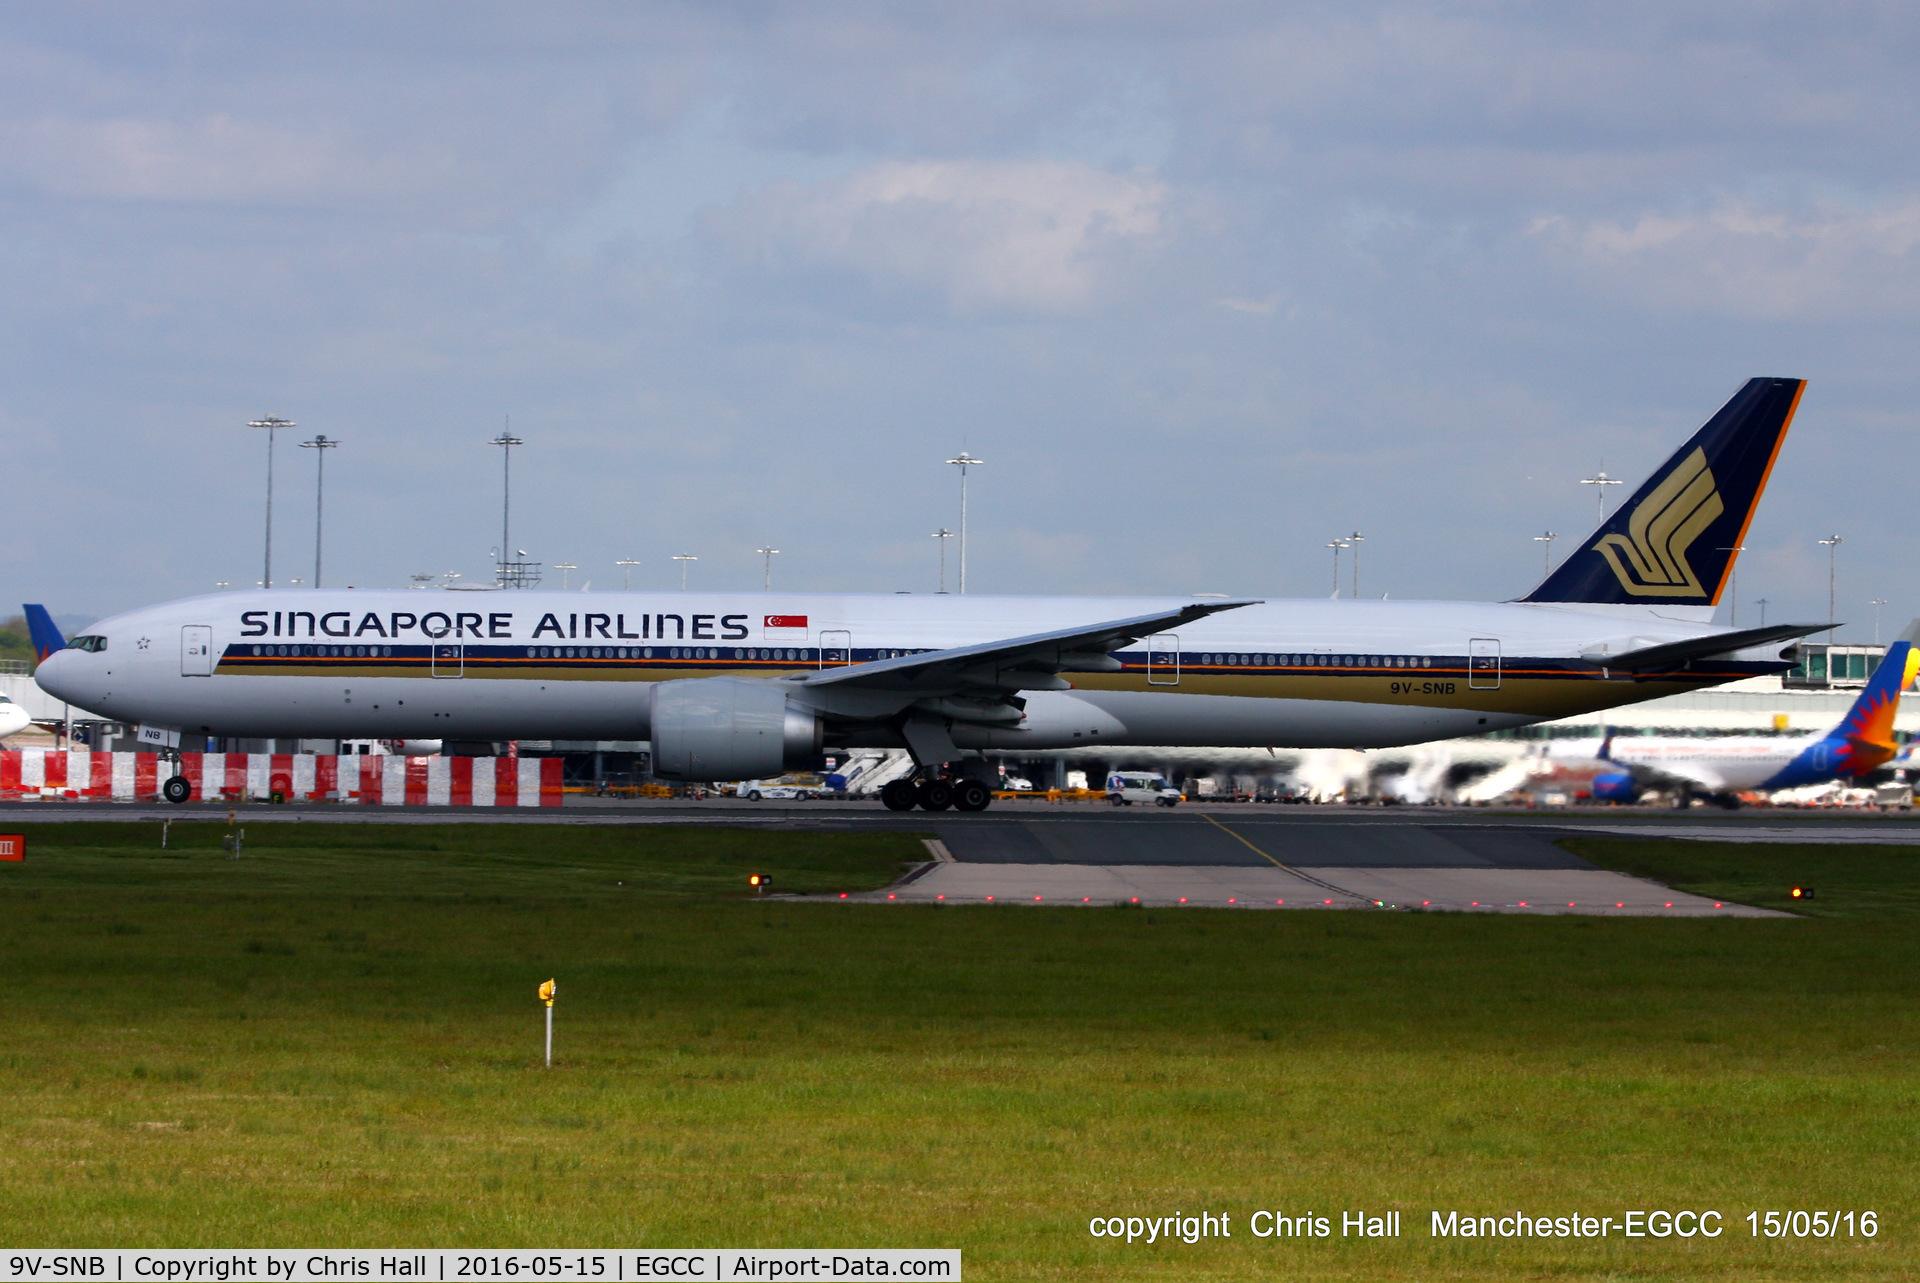 9V-SNB, 2015 Boeing 777-312/ER C/N 42241, Singapore Airlines